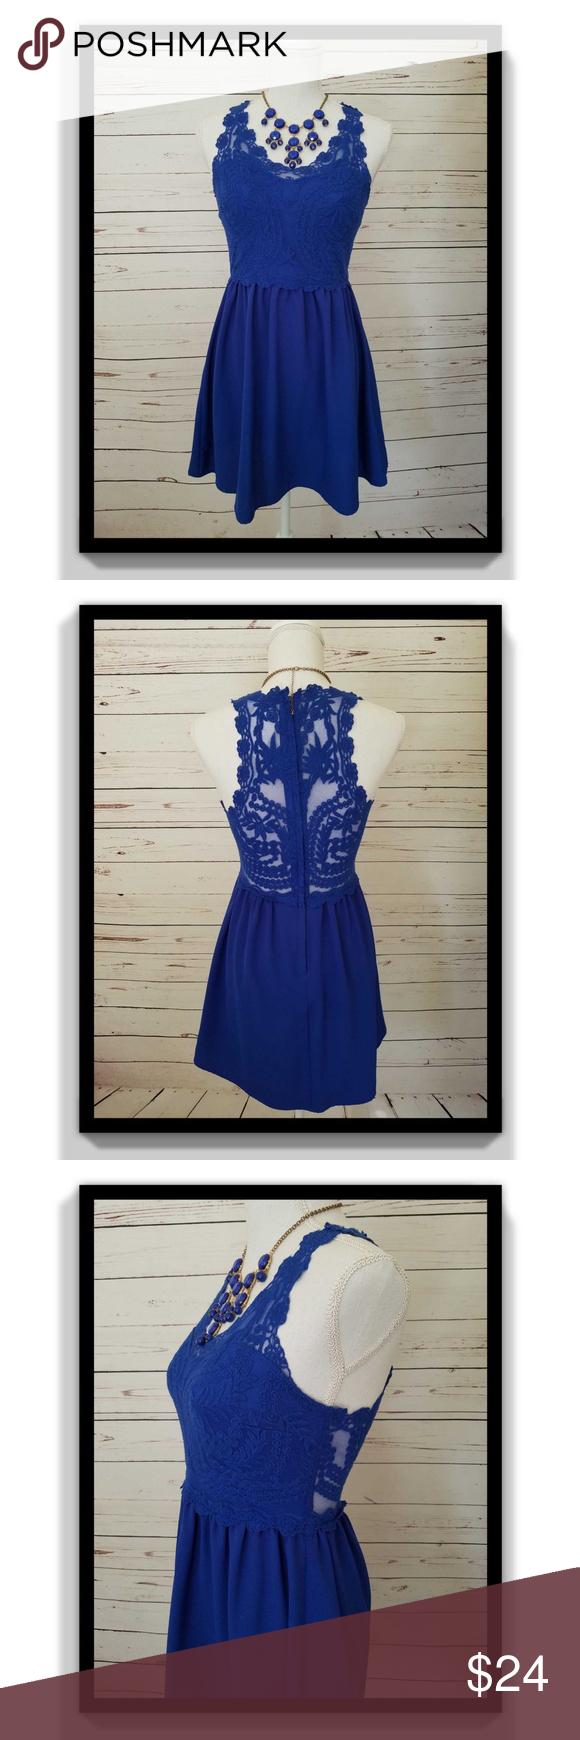 H&m blue lace dress  H uM Lace Dress WSeethrough Back Blue Size  NWT  My Posh Picks